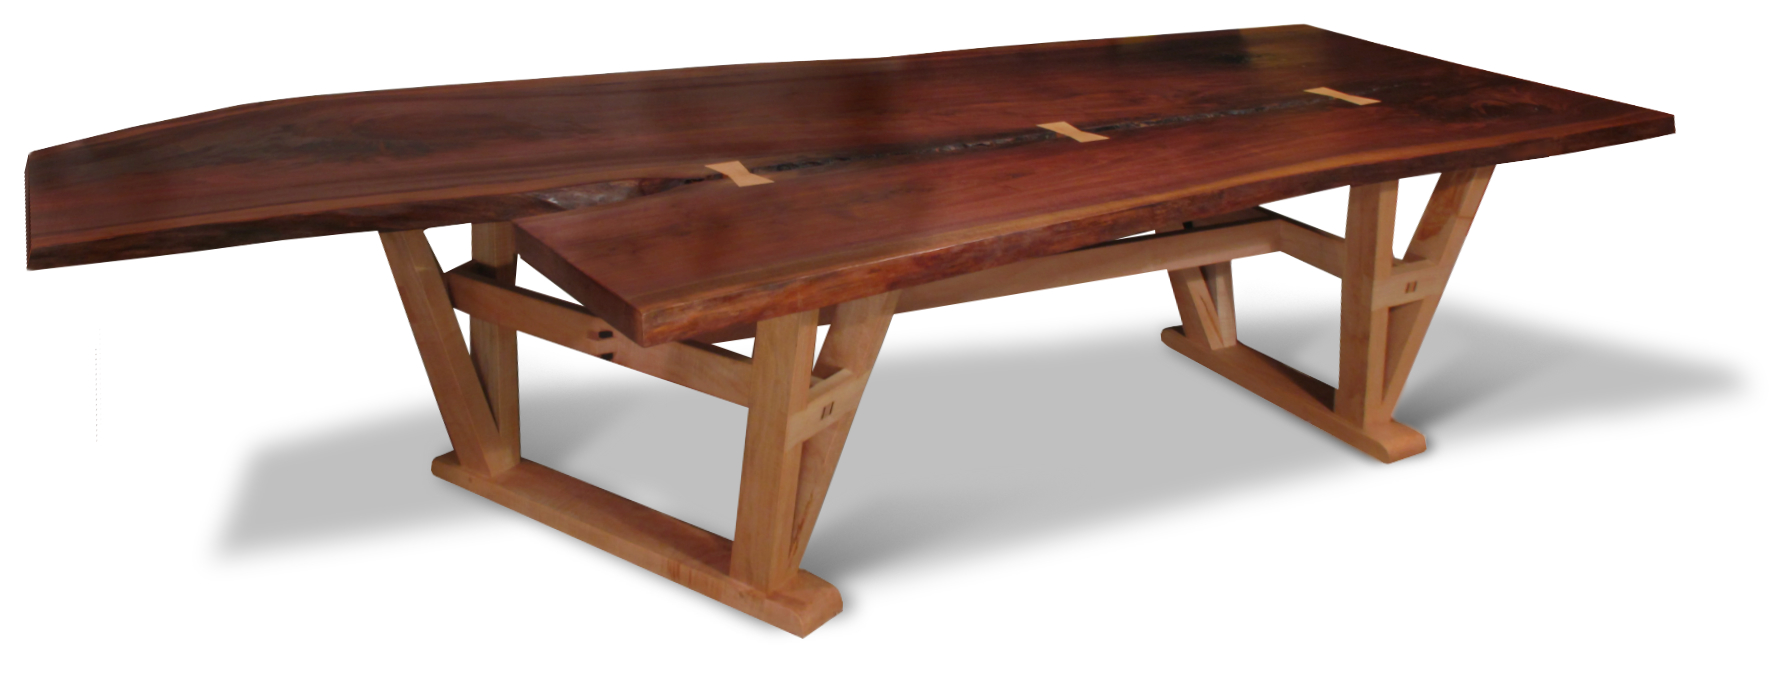 Pete E Michelinie Fine Furniture Live Edge Walnut  : liveedgetable from michelinie.com size 1781 x 677 jpeg 472kB